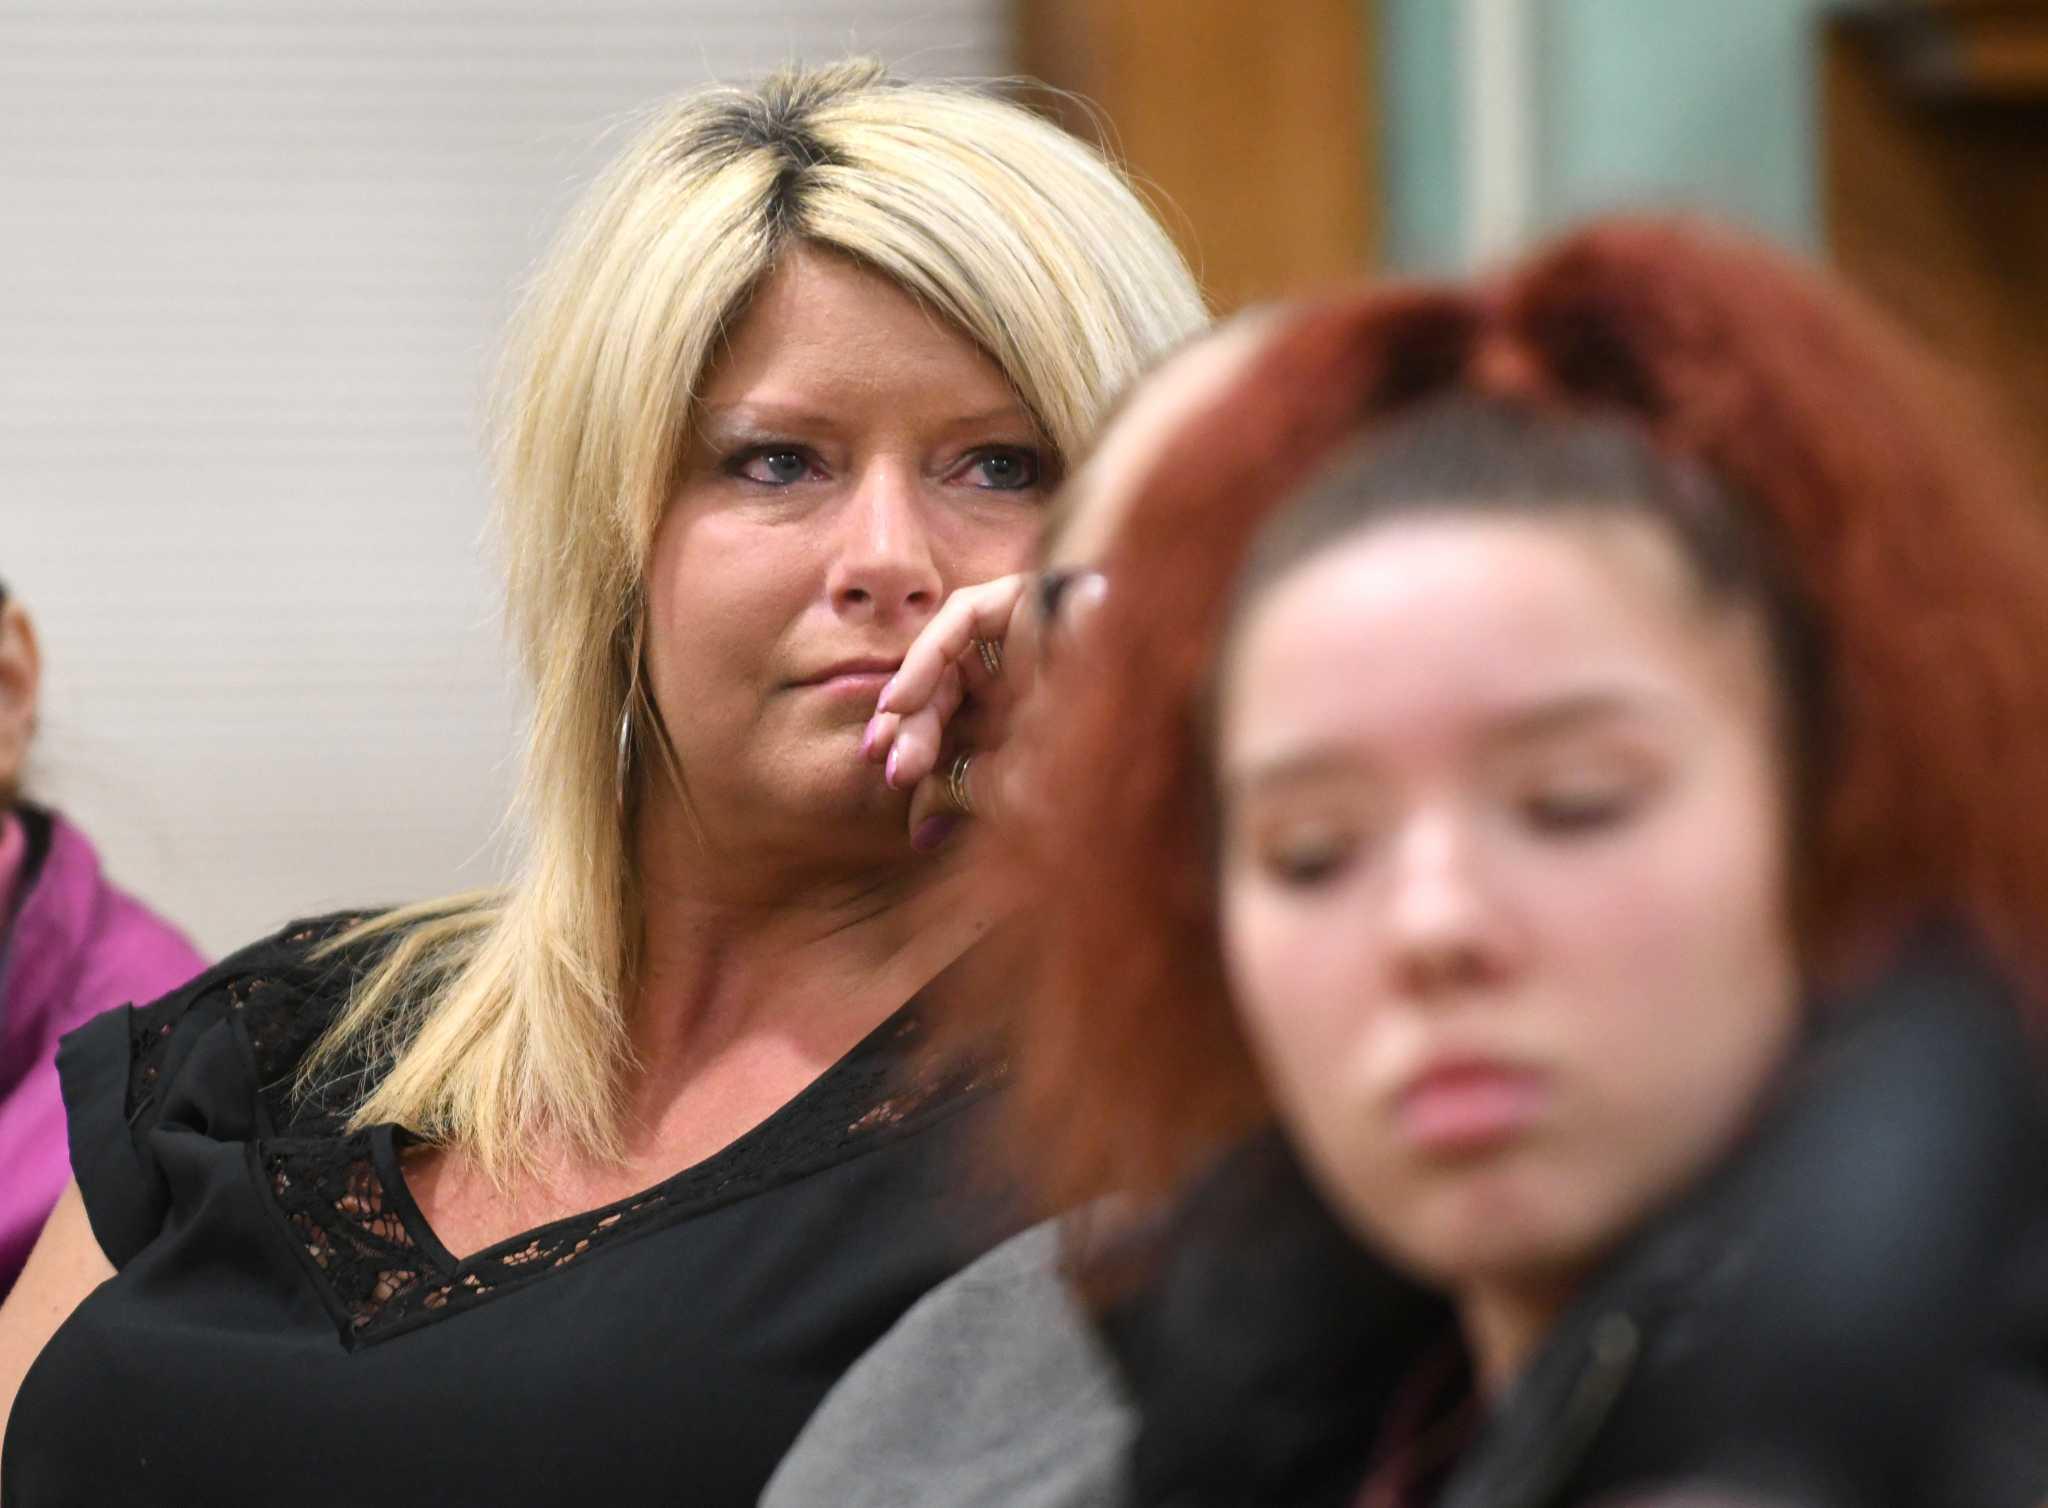 timesunion.com - Brendan J. Lyons - Wife of Cohoes' mayor hospitalized